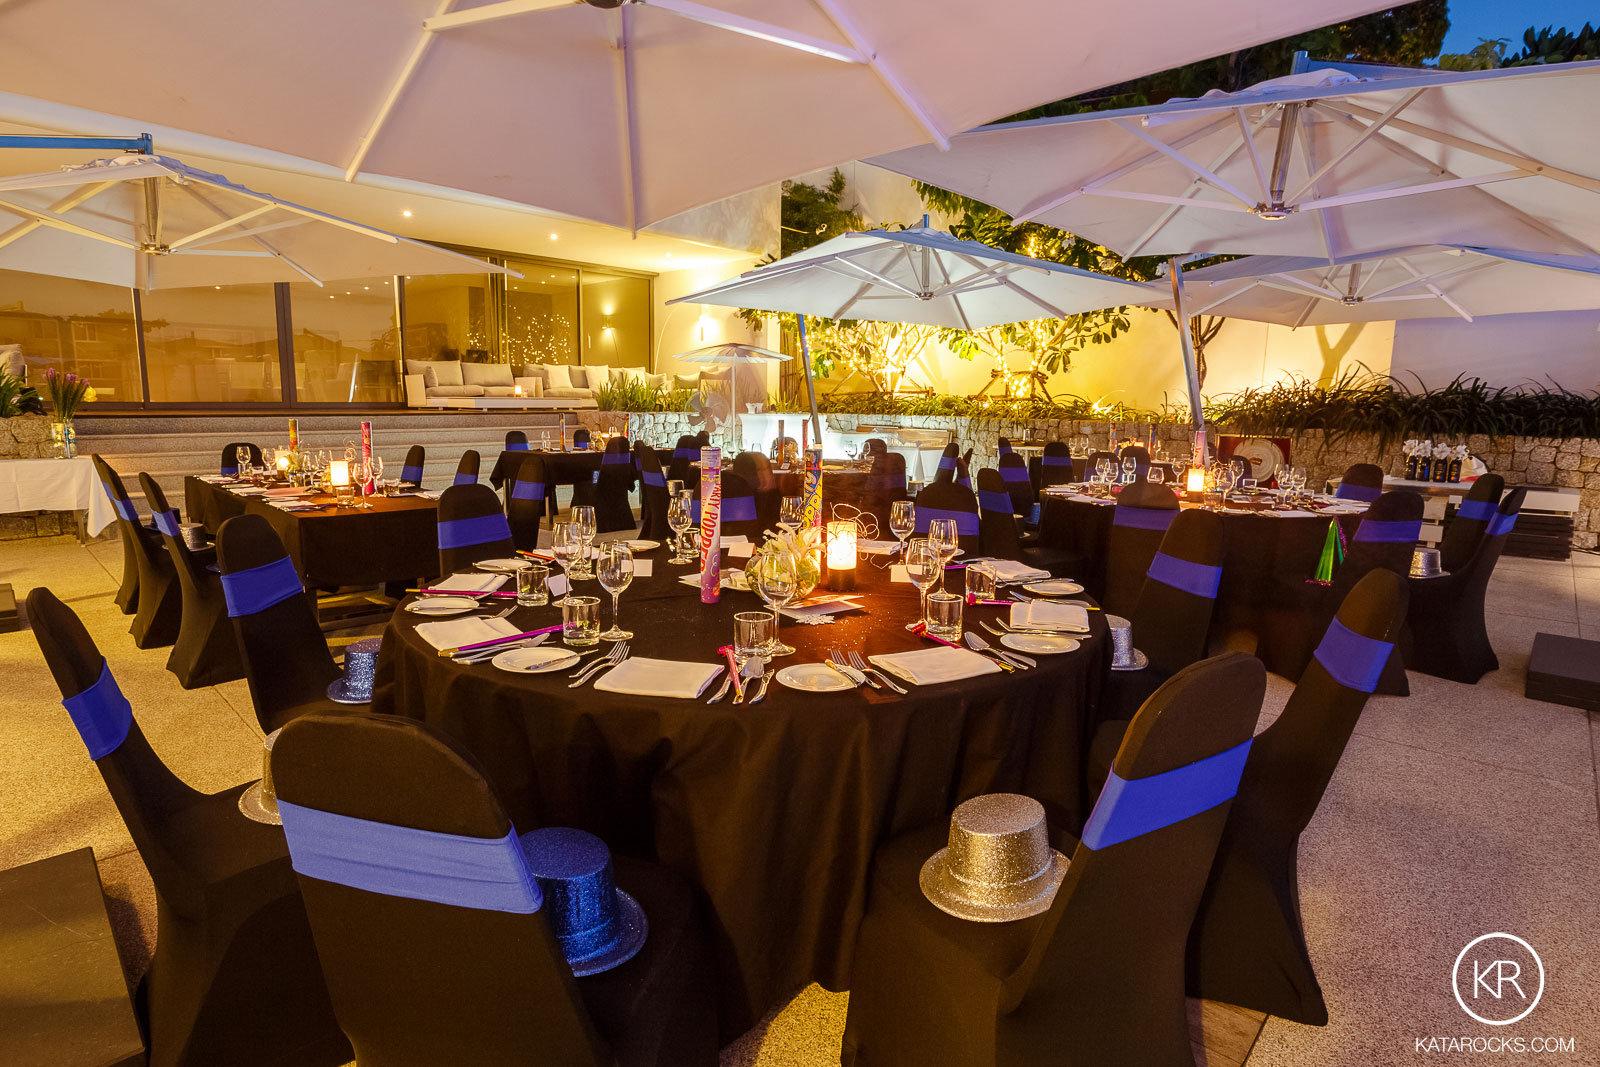 Professional Meeting & Events at Kata Rocks